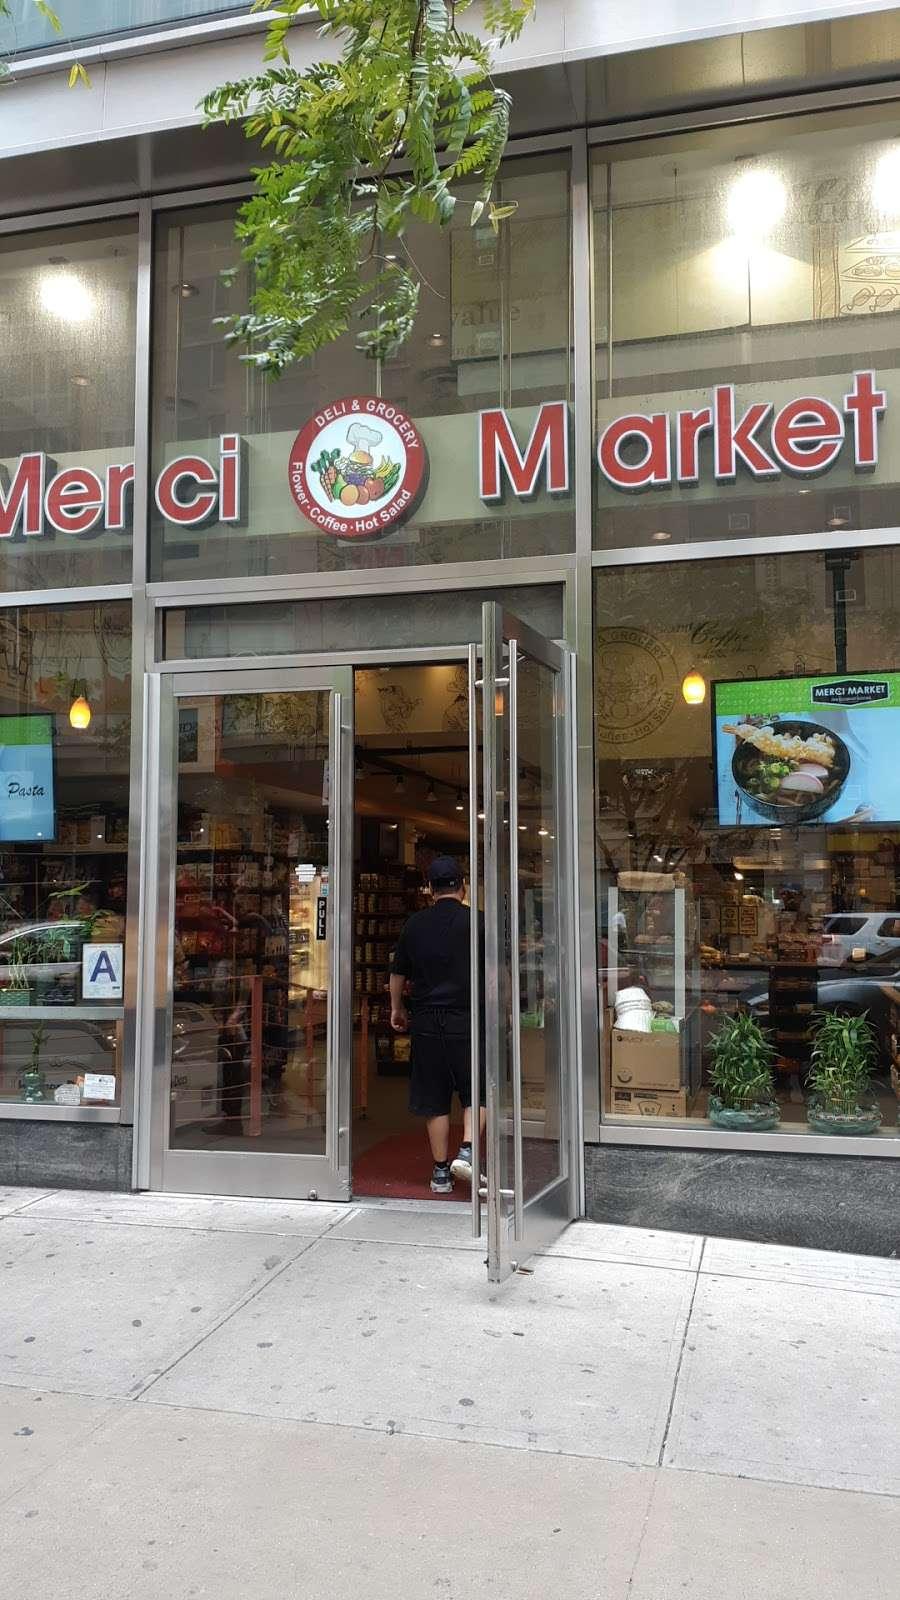 Merci Market - store  | Photo 3 of 10 | Address: 350 W 42nd St, New York, NY 10036, USA | Phone: (212) 560-9300